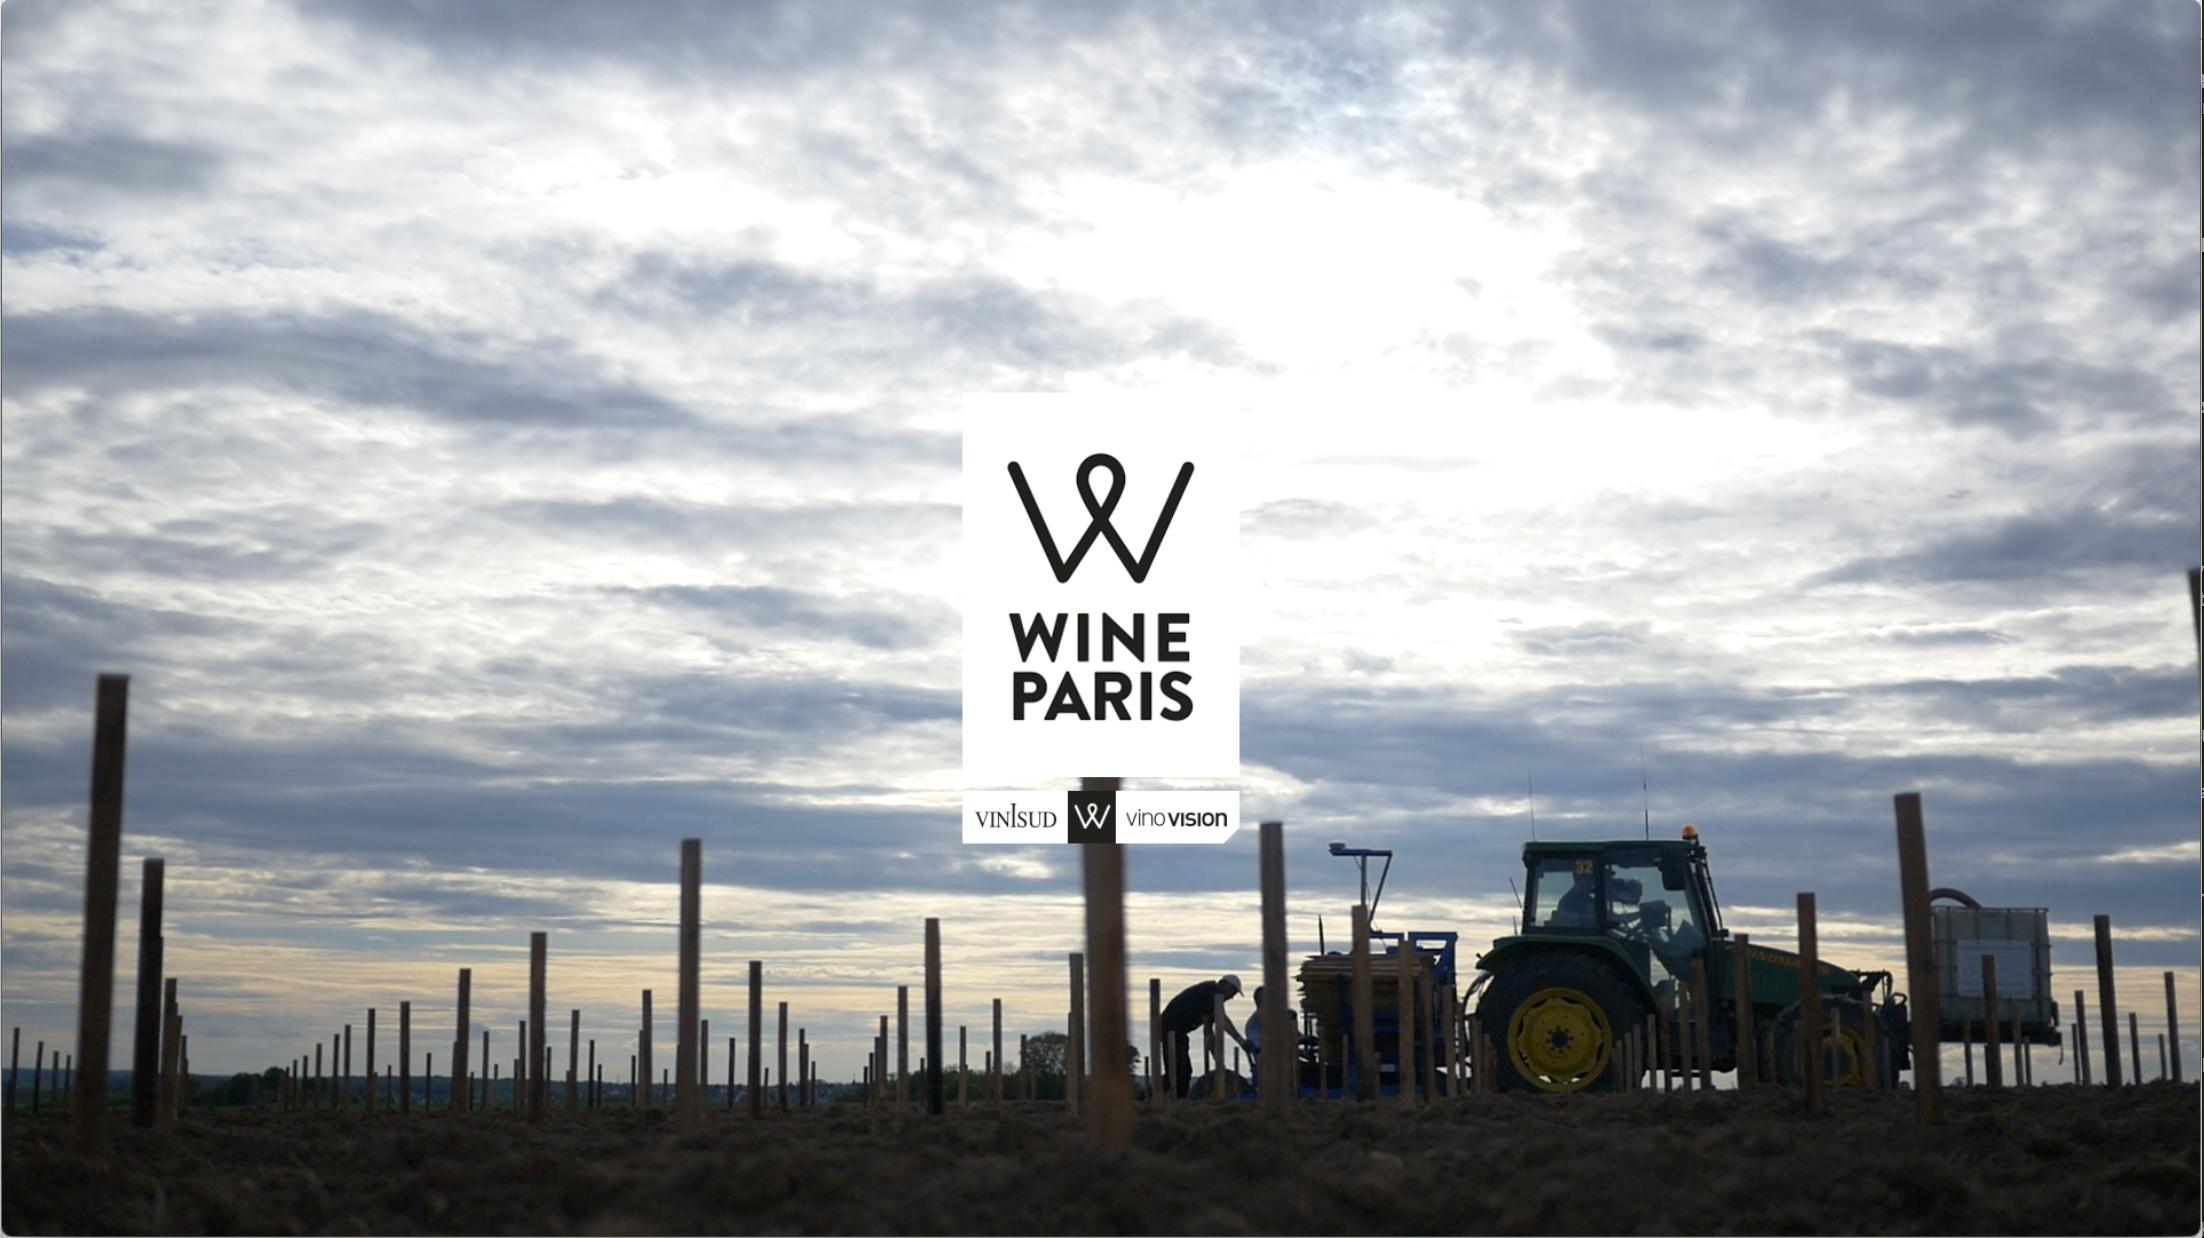 Paris I Winerie Parisienne